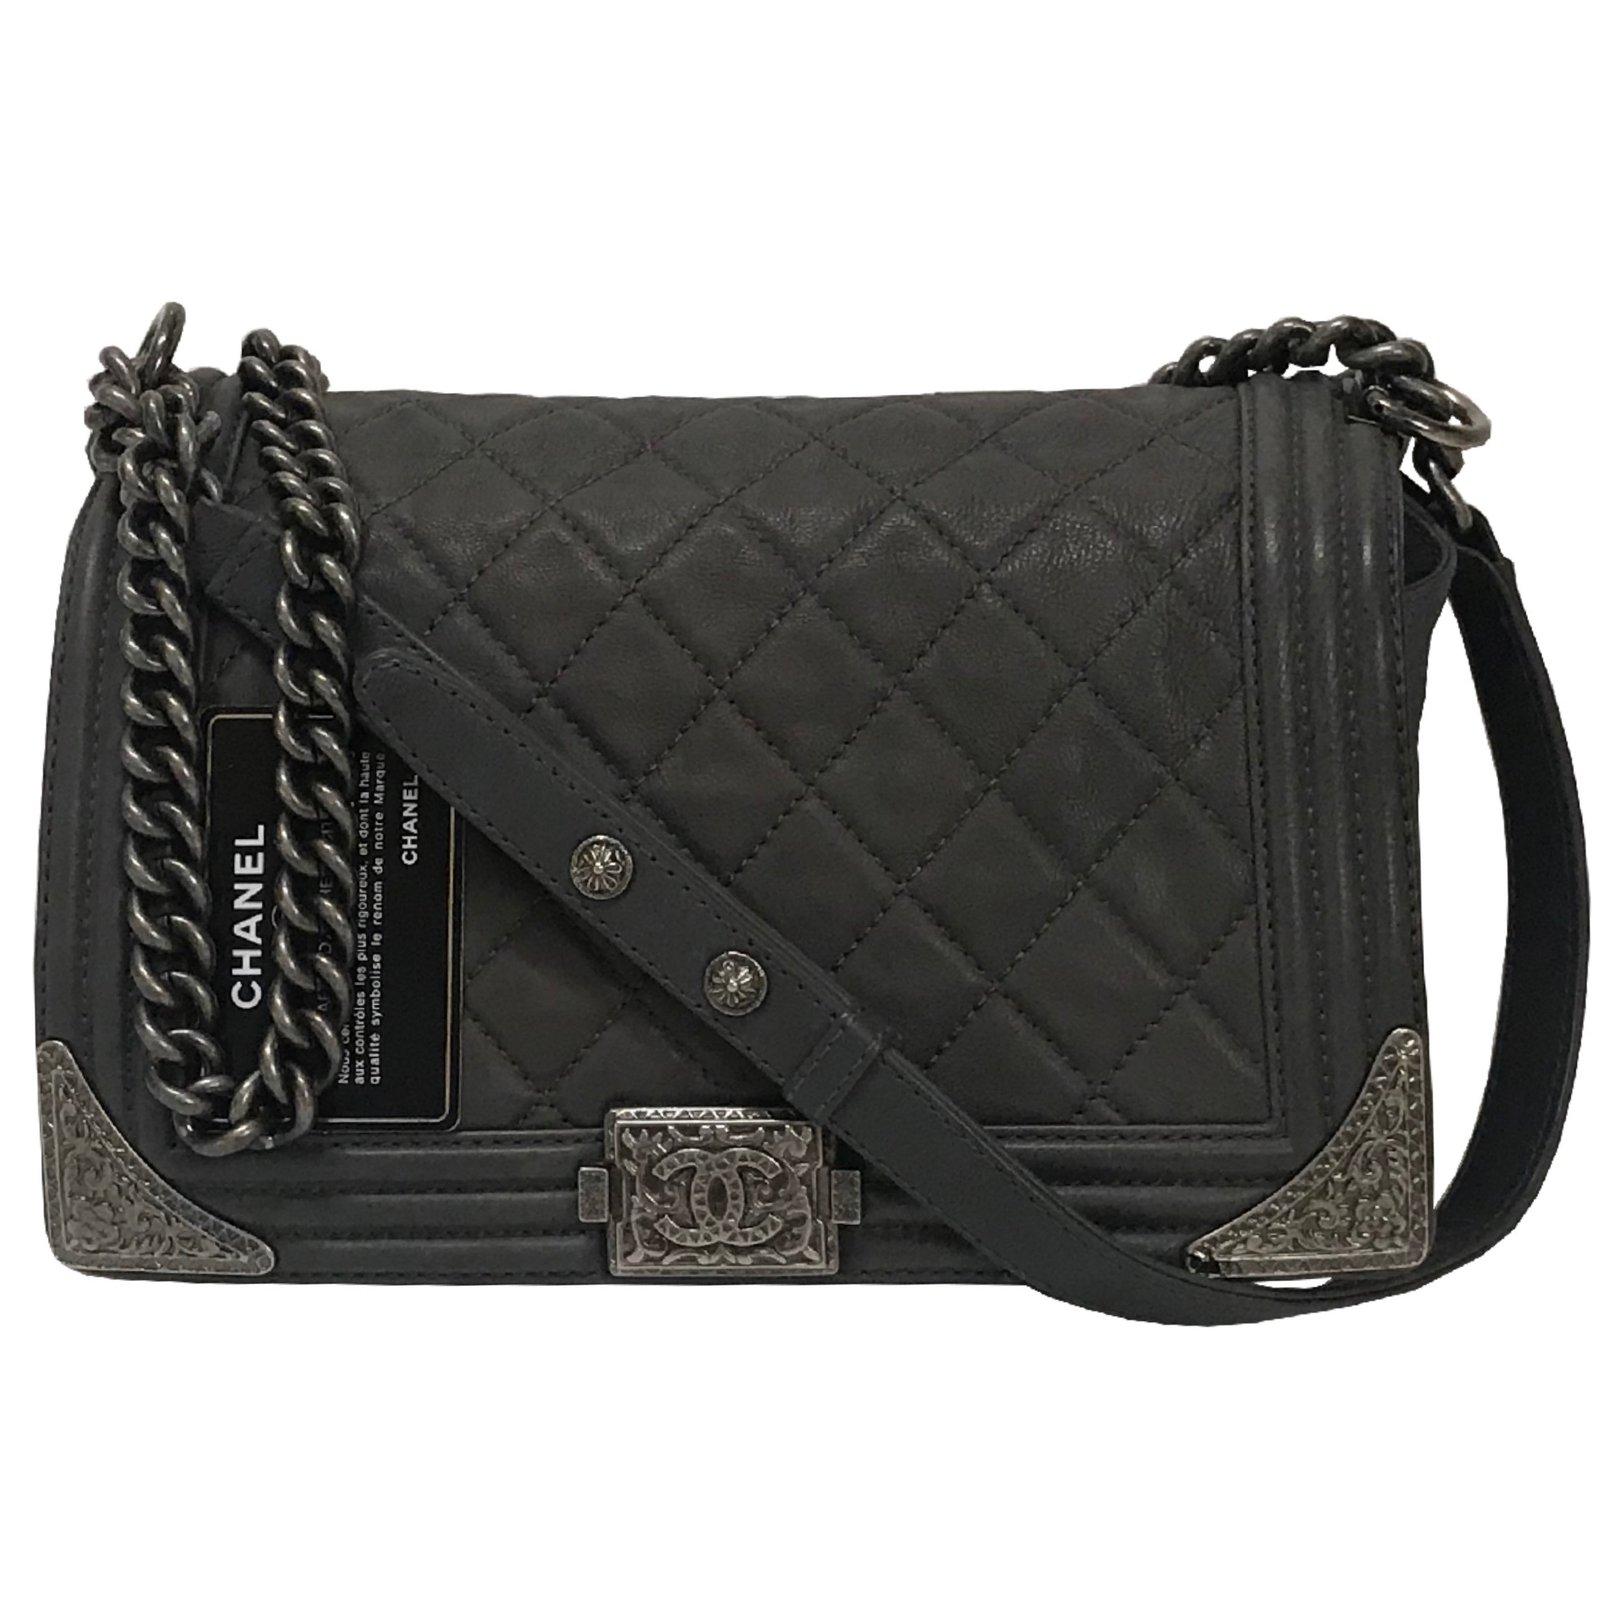 b7872a54459c Chanel Chanel Engraved Corners Boy Cowboy Flap Quilted Medium Bag Handbags  Leather Grey ref.66717